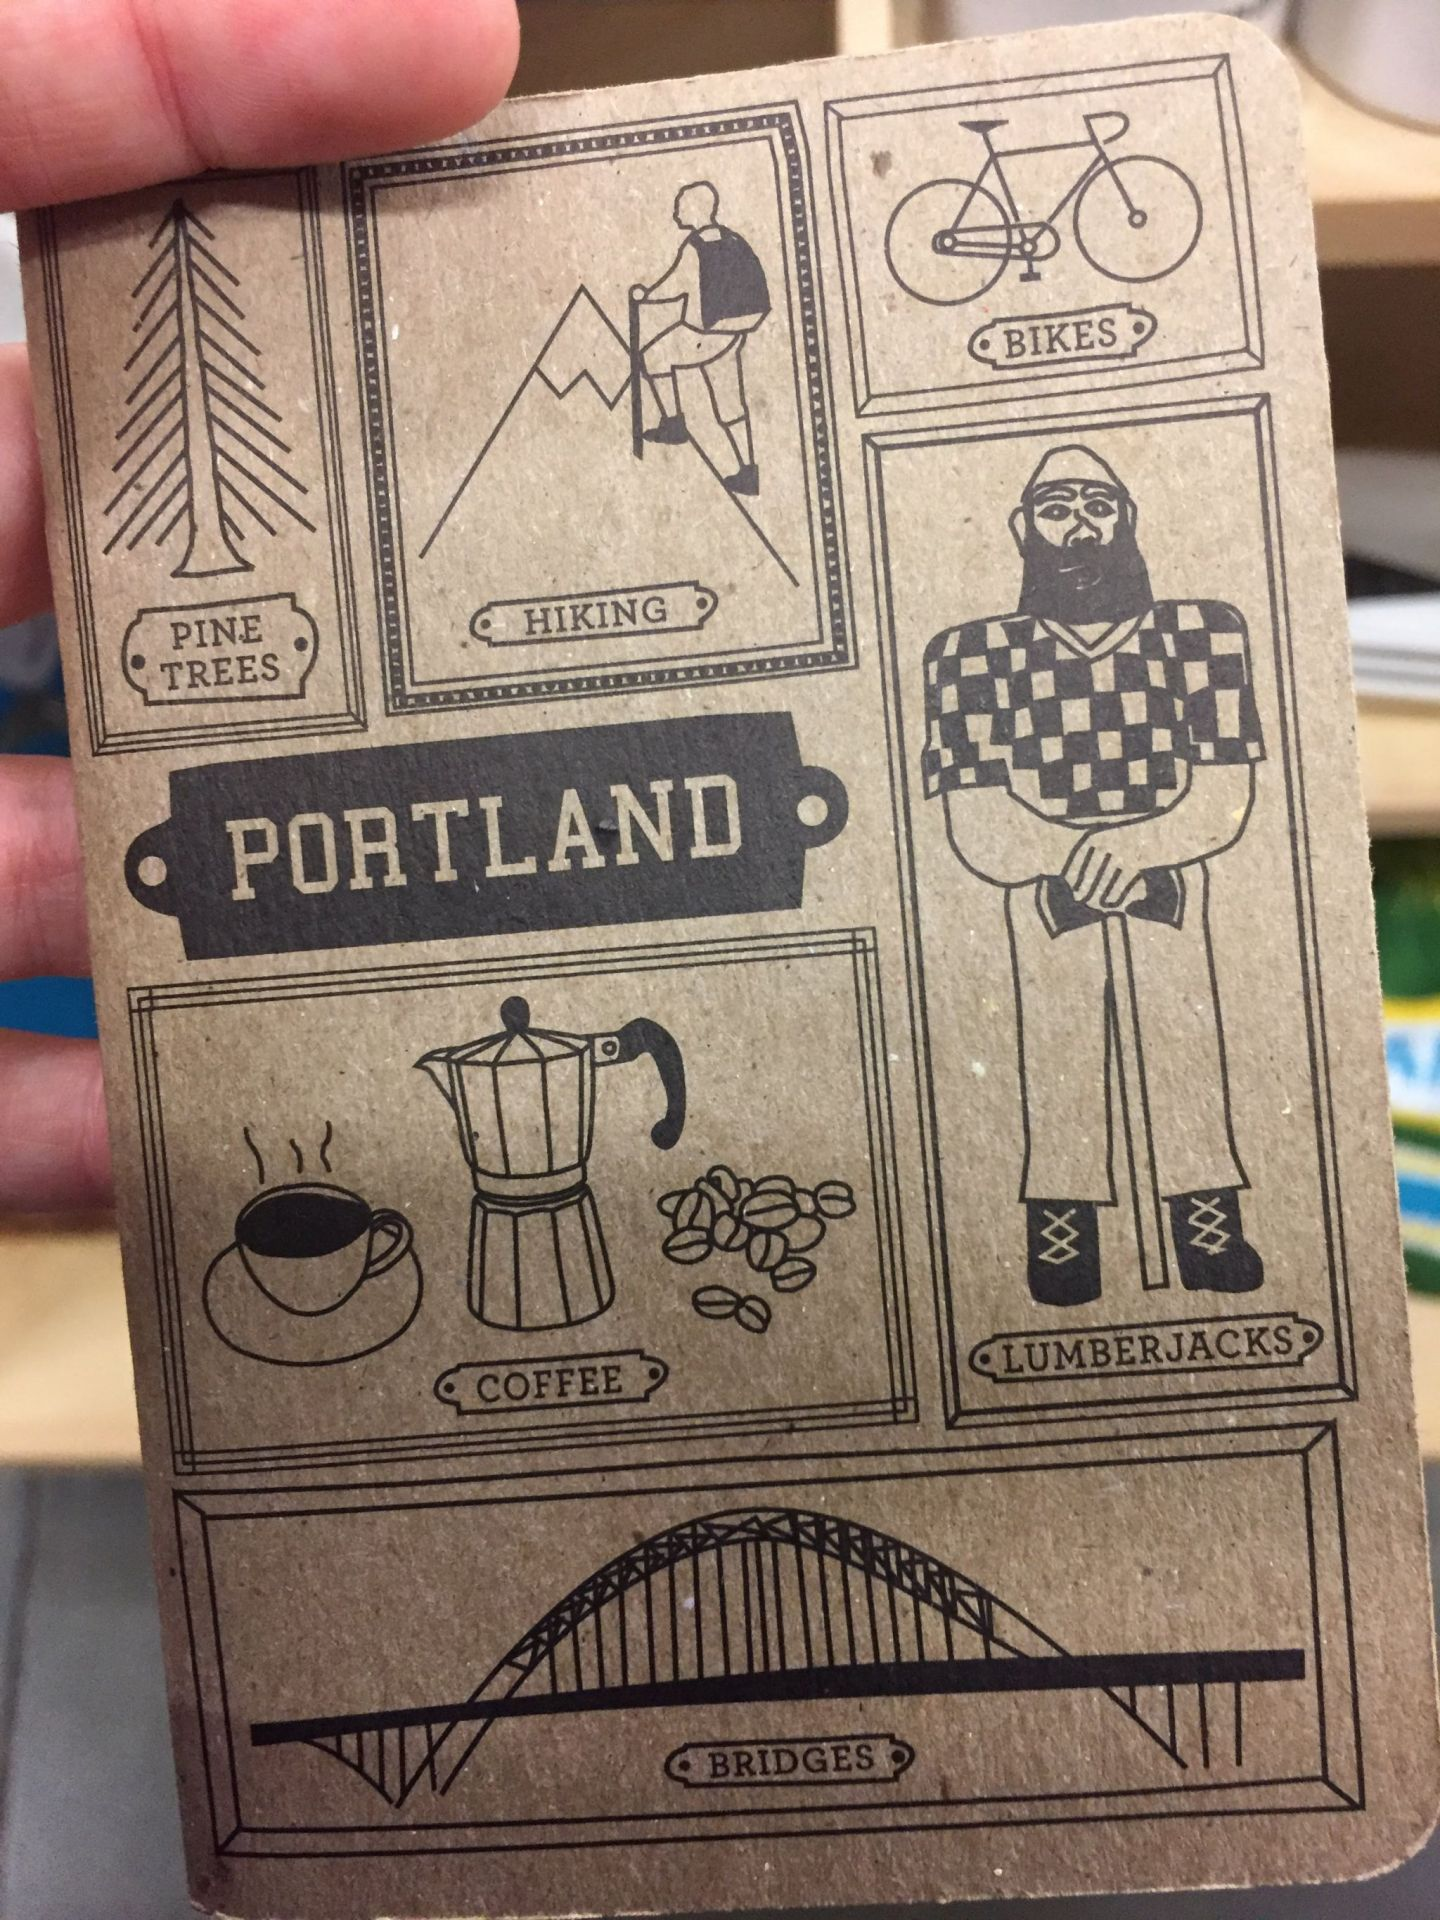 Portland souvenirs